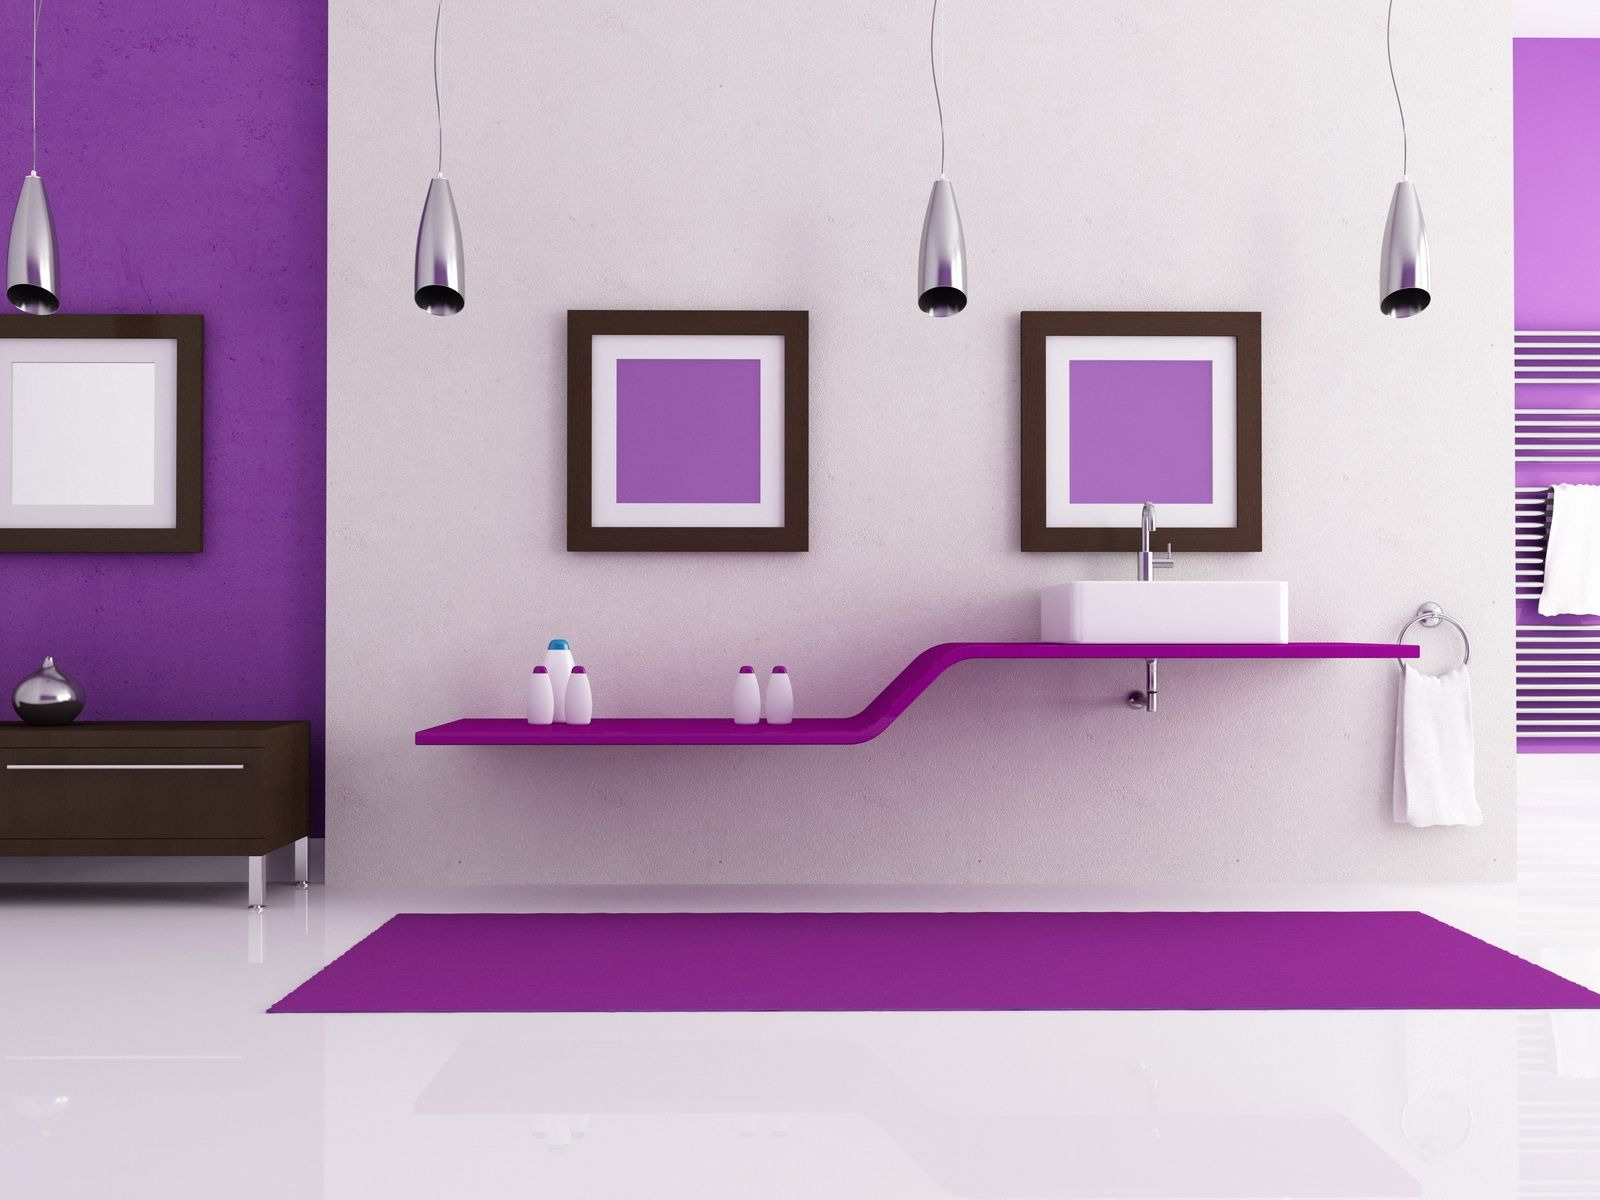 Marvelous Interior Design In Purple Color